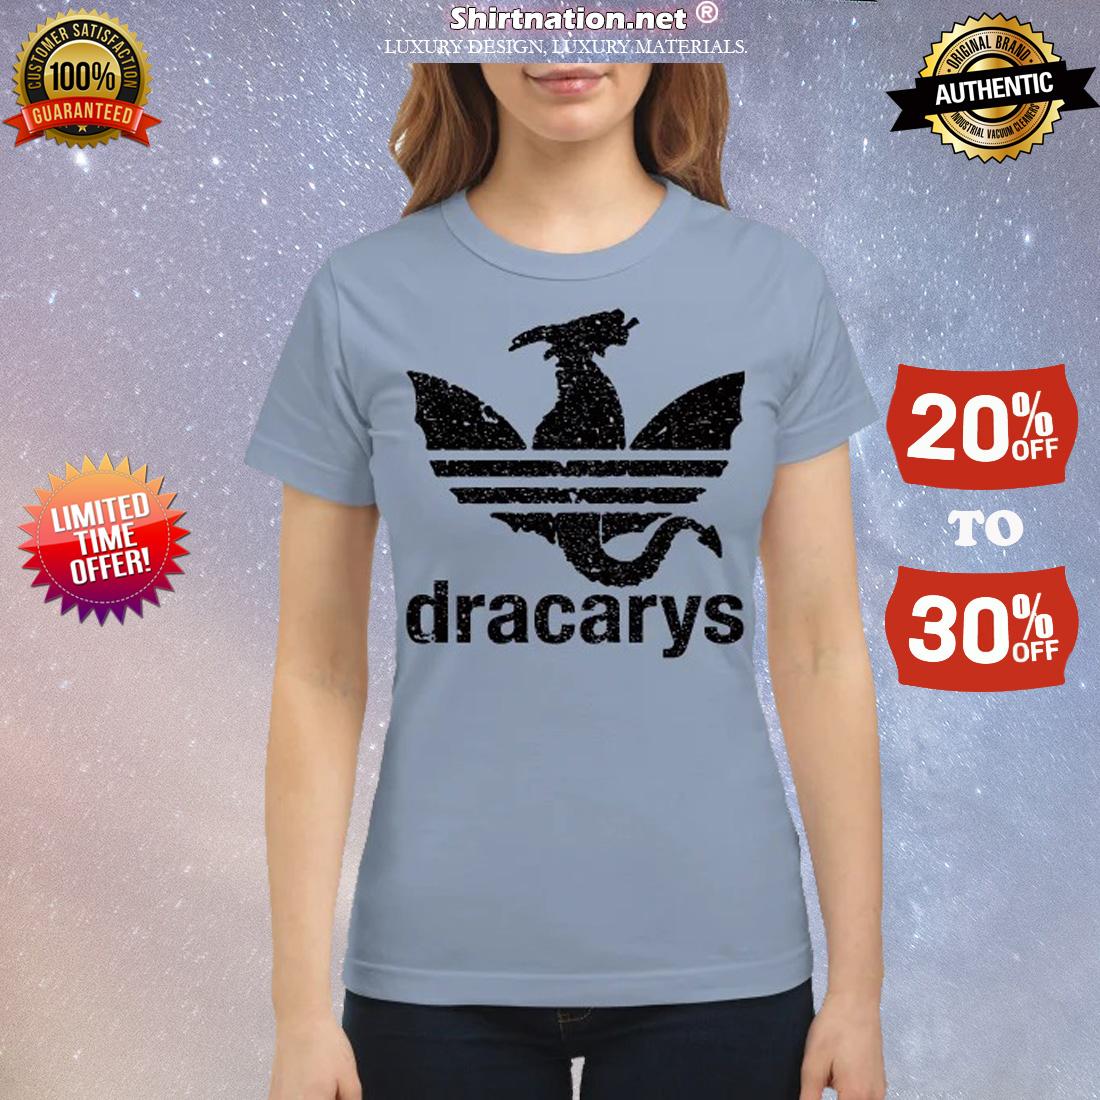 Adidas Dracarys shirt